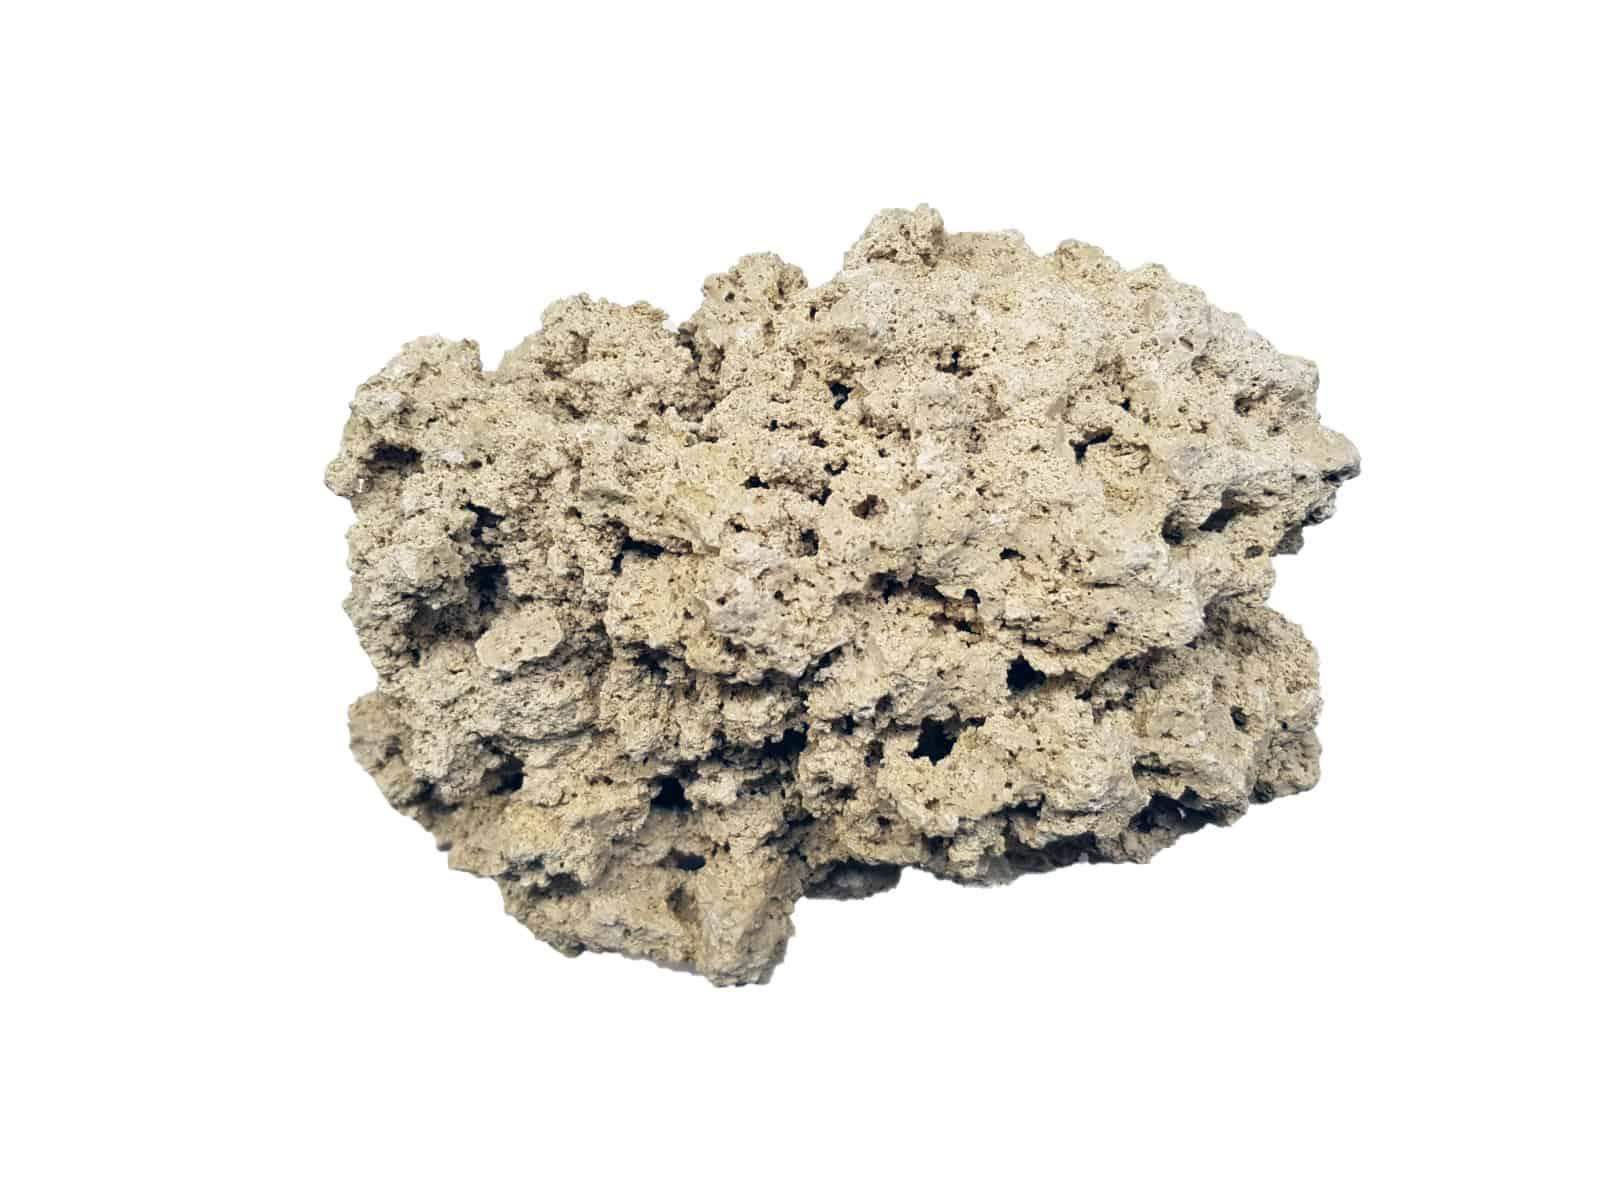 AQUADECOR-safe-the-reef-rock